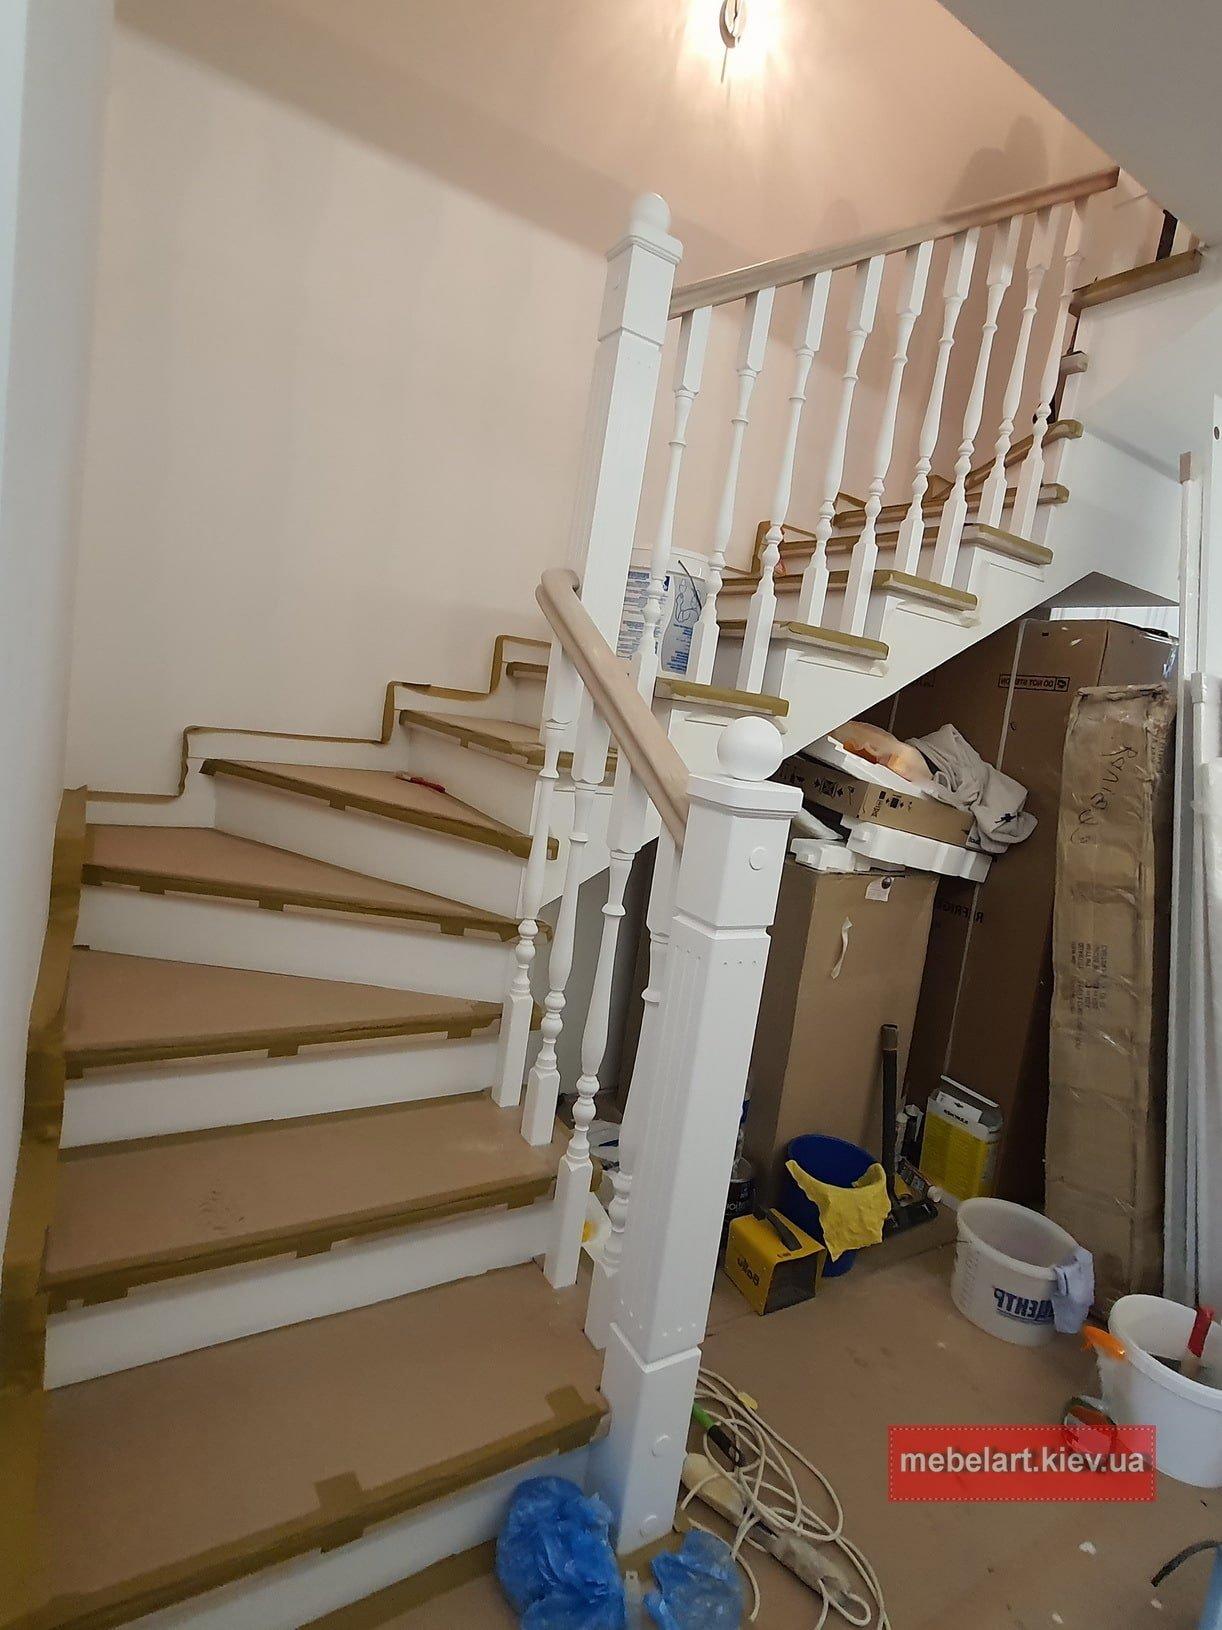 г образная деревянная лестница на заказ Конча заспа